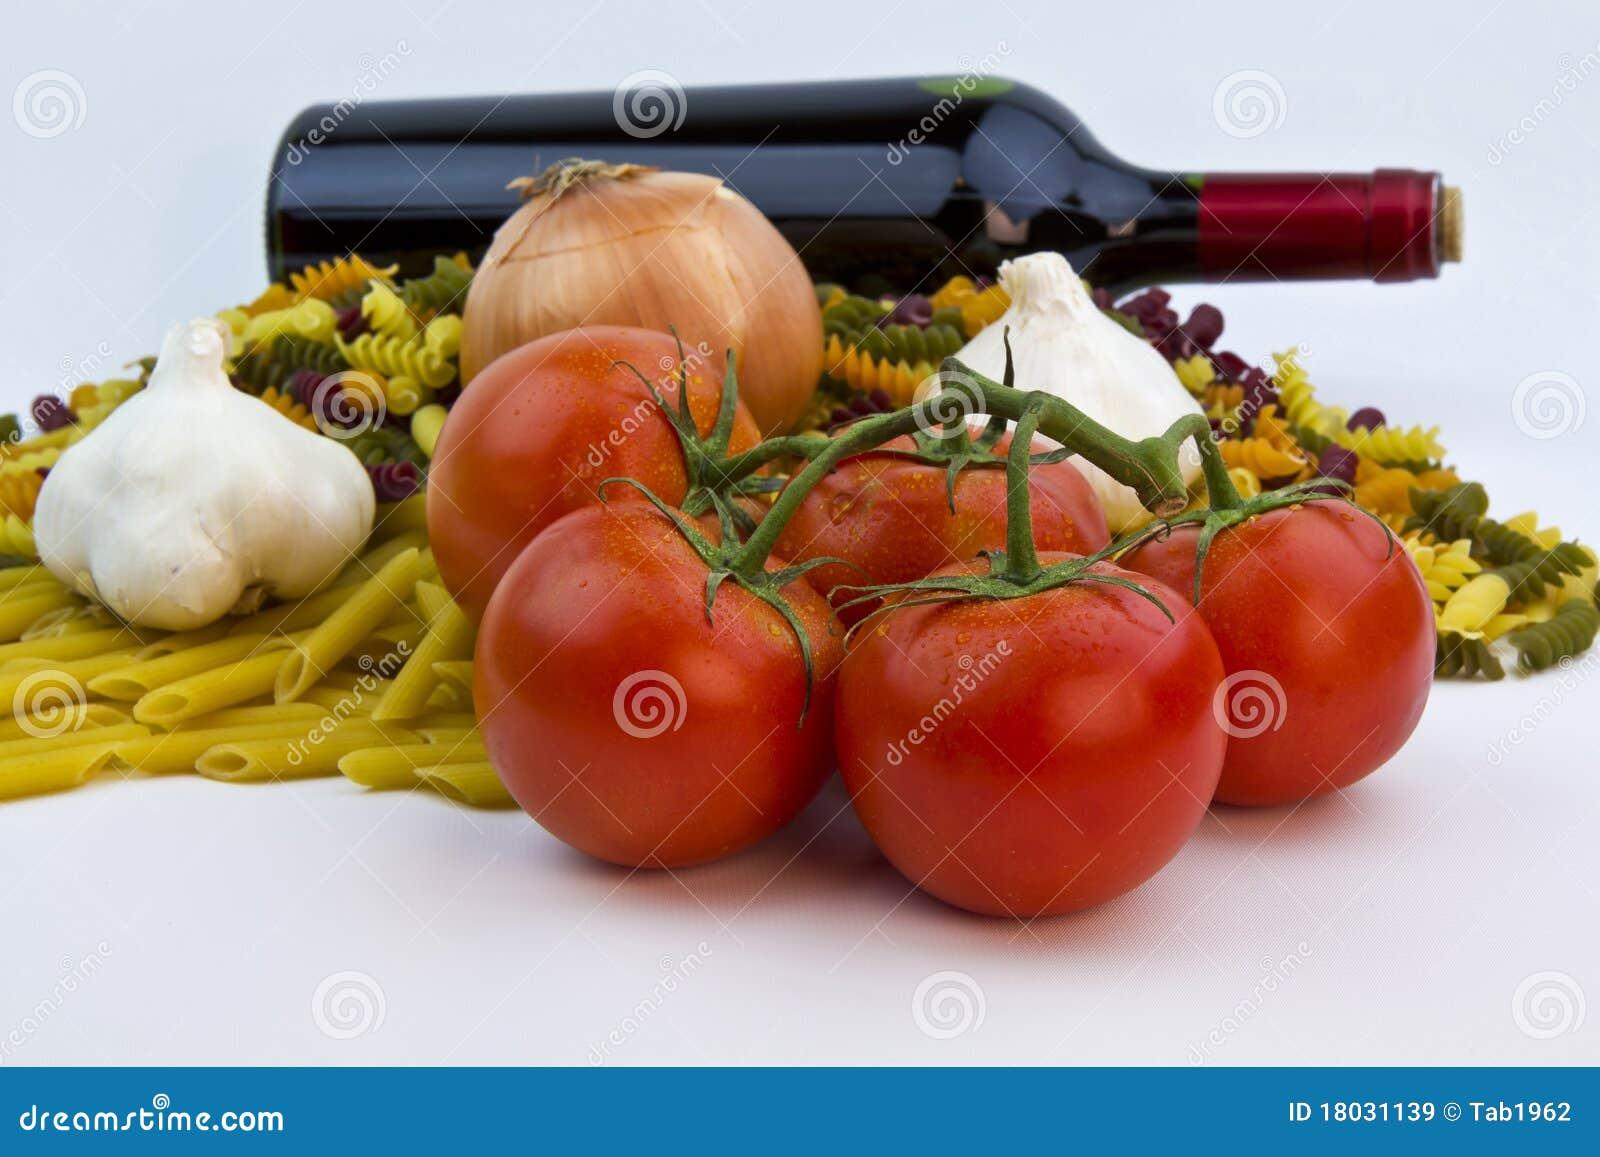 how to use garlic vine